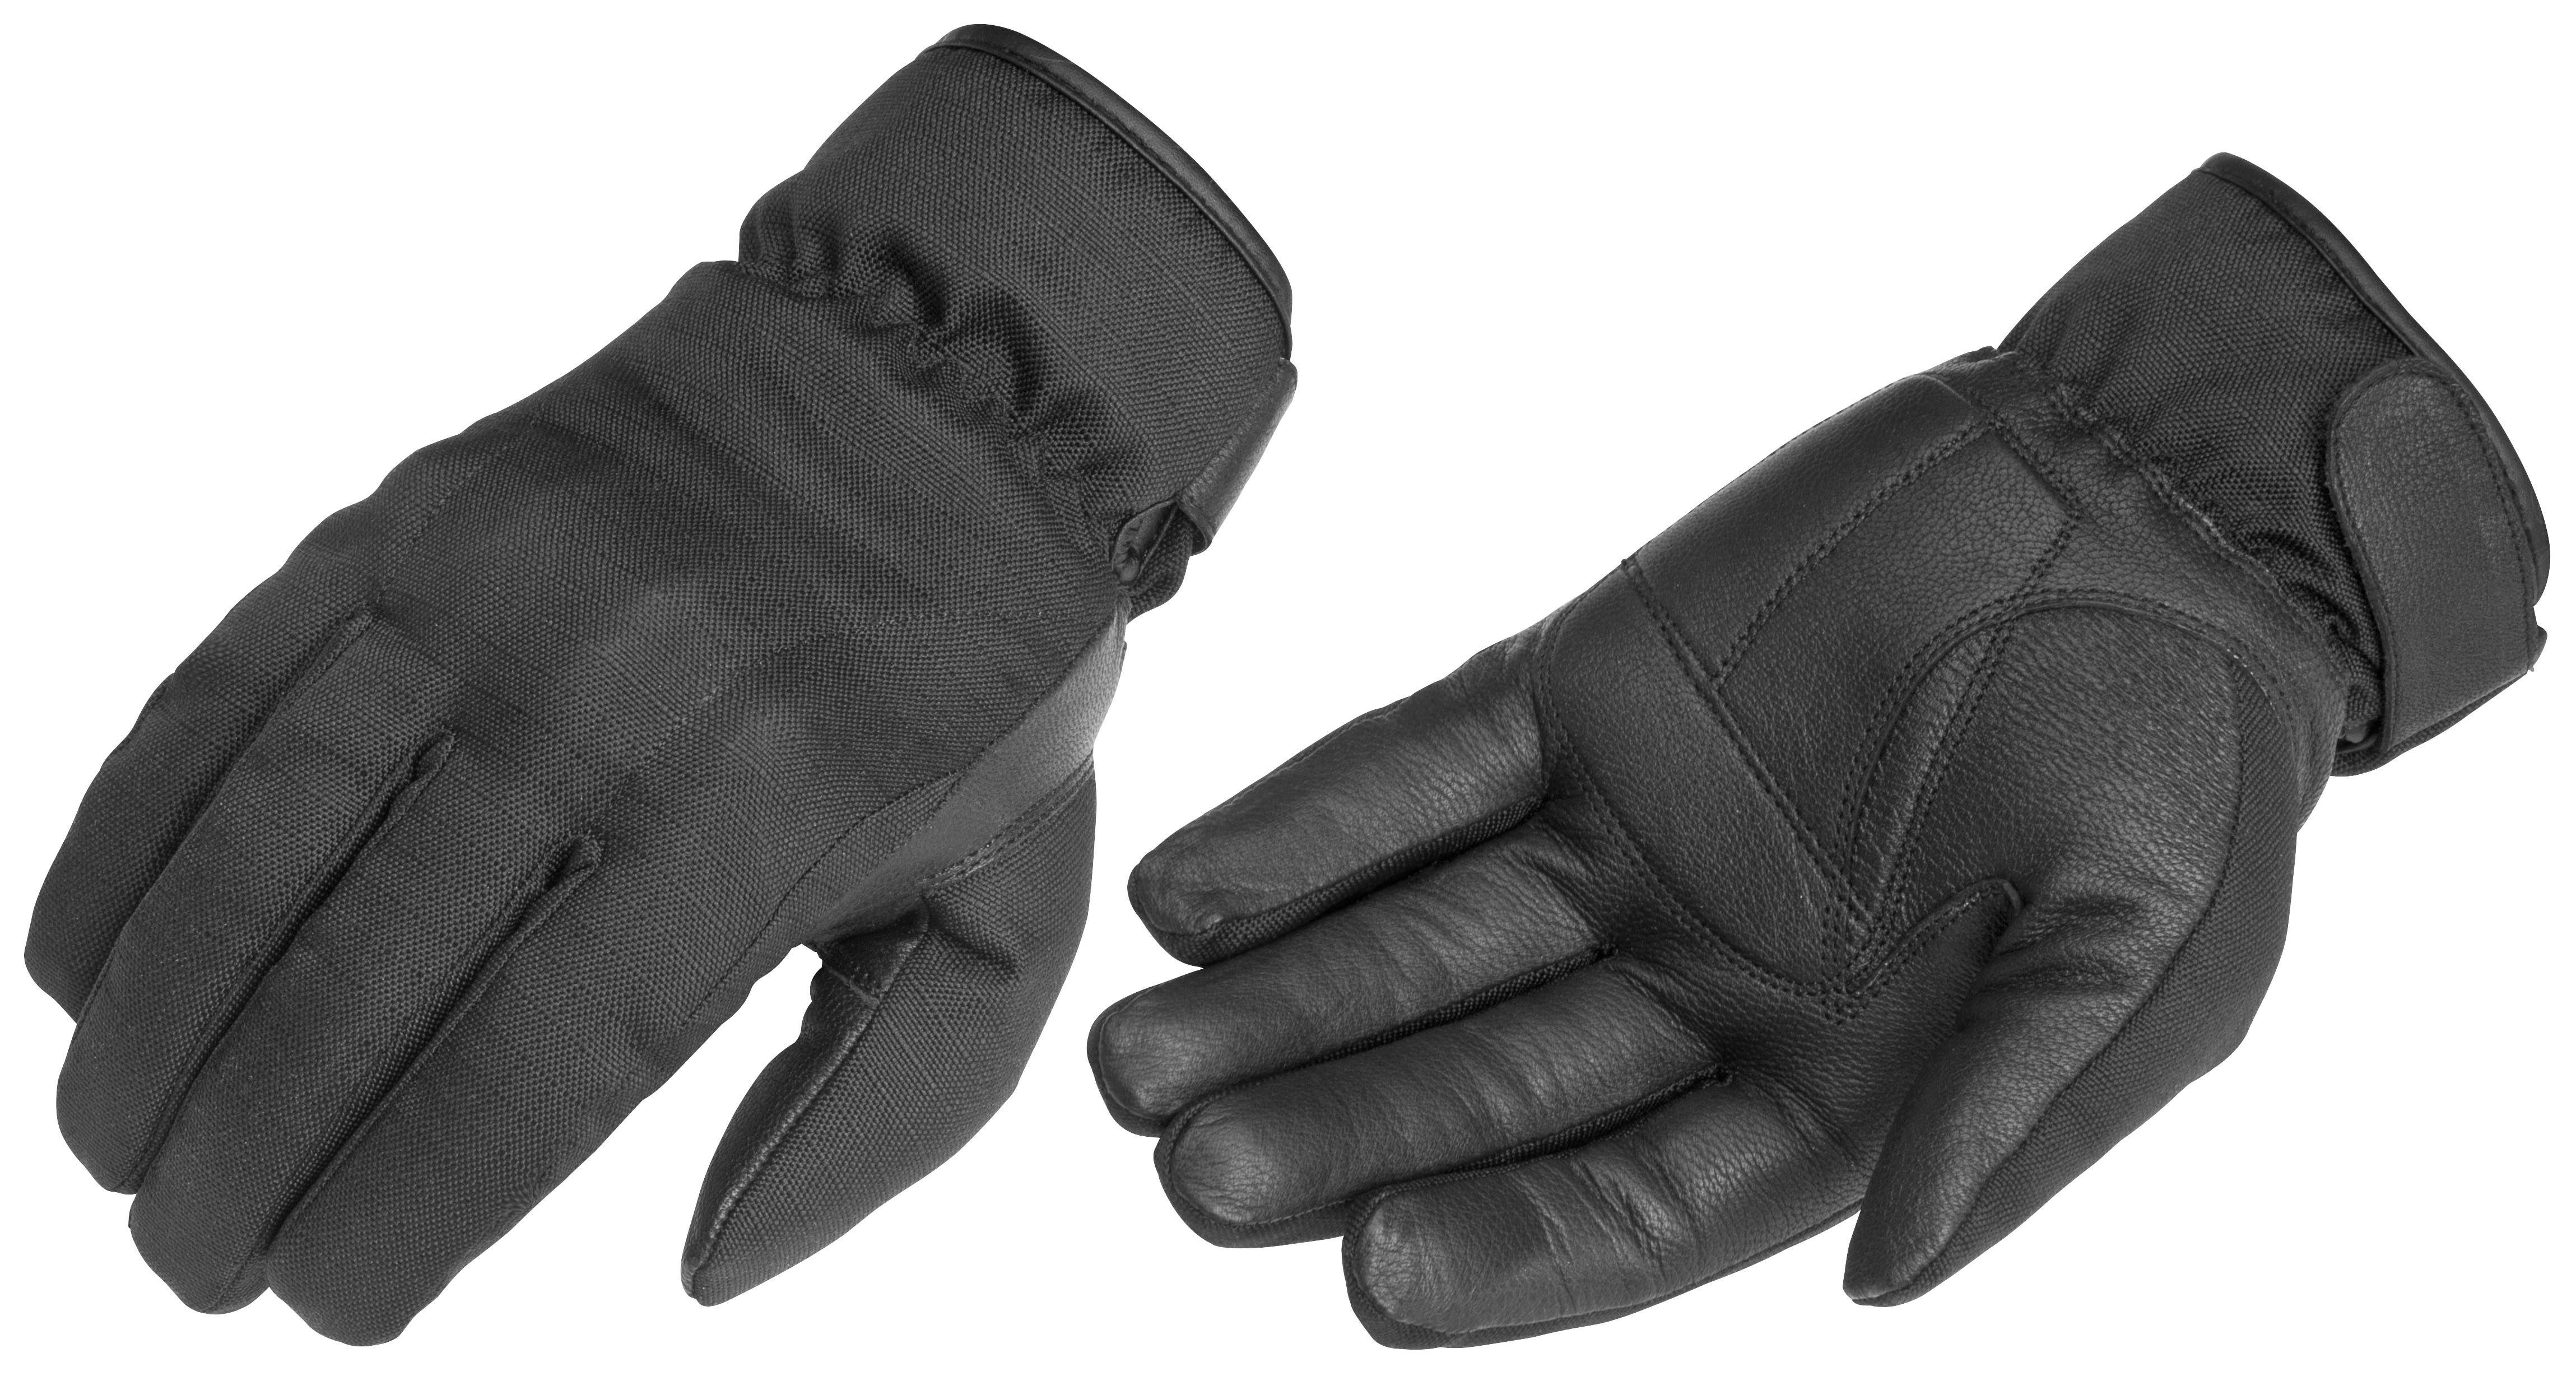 Mens leather gloves sale - Mens Leather Gloves Sale 48